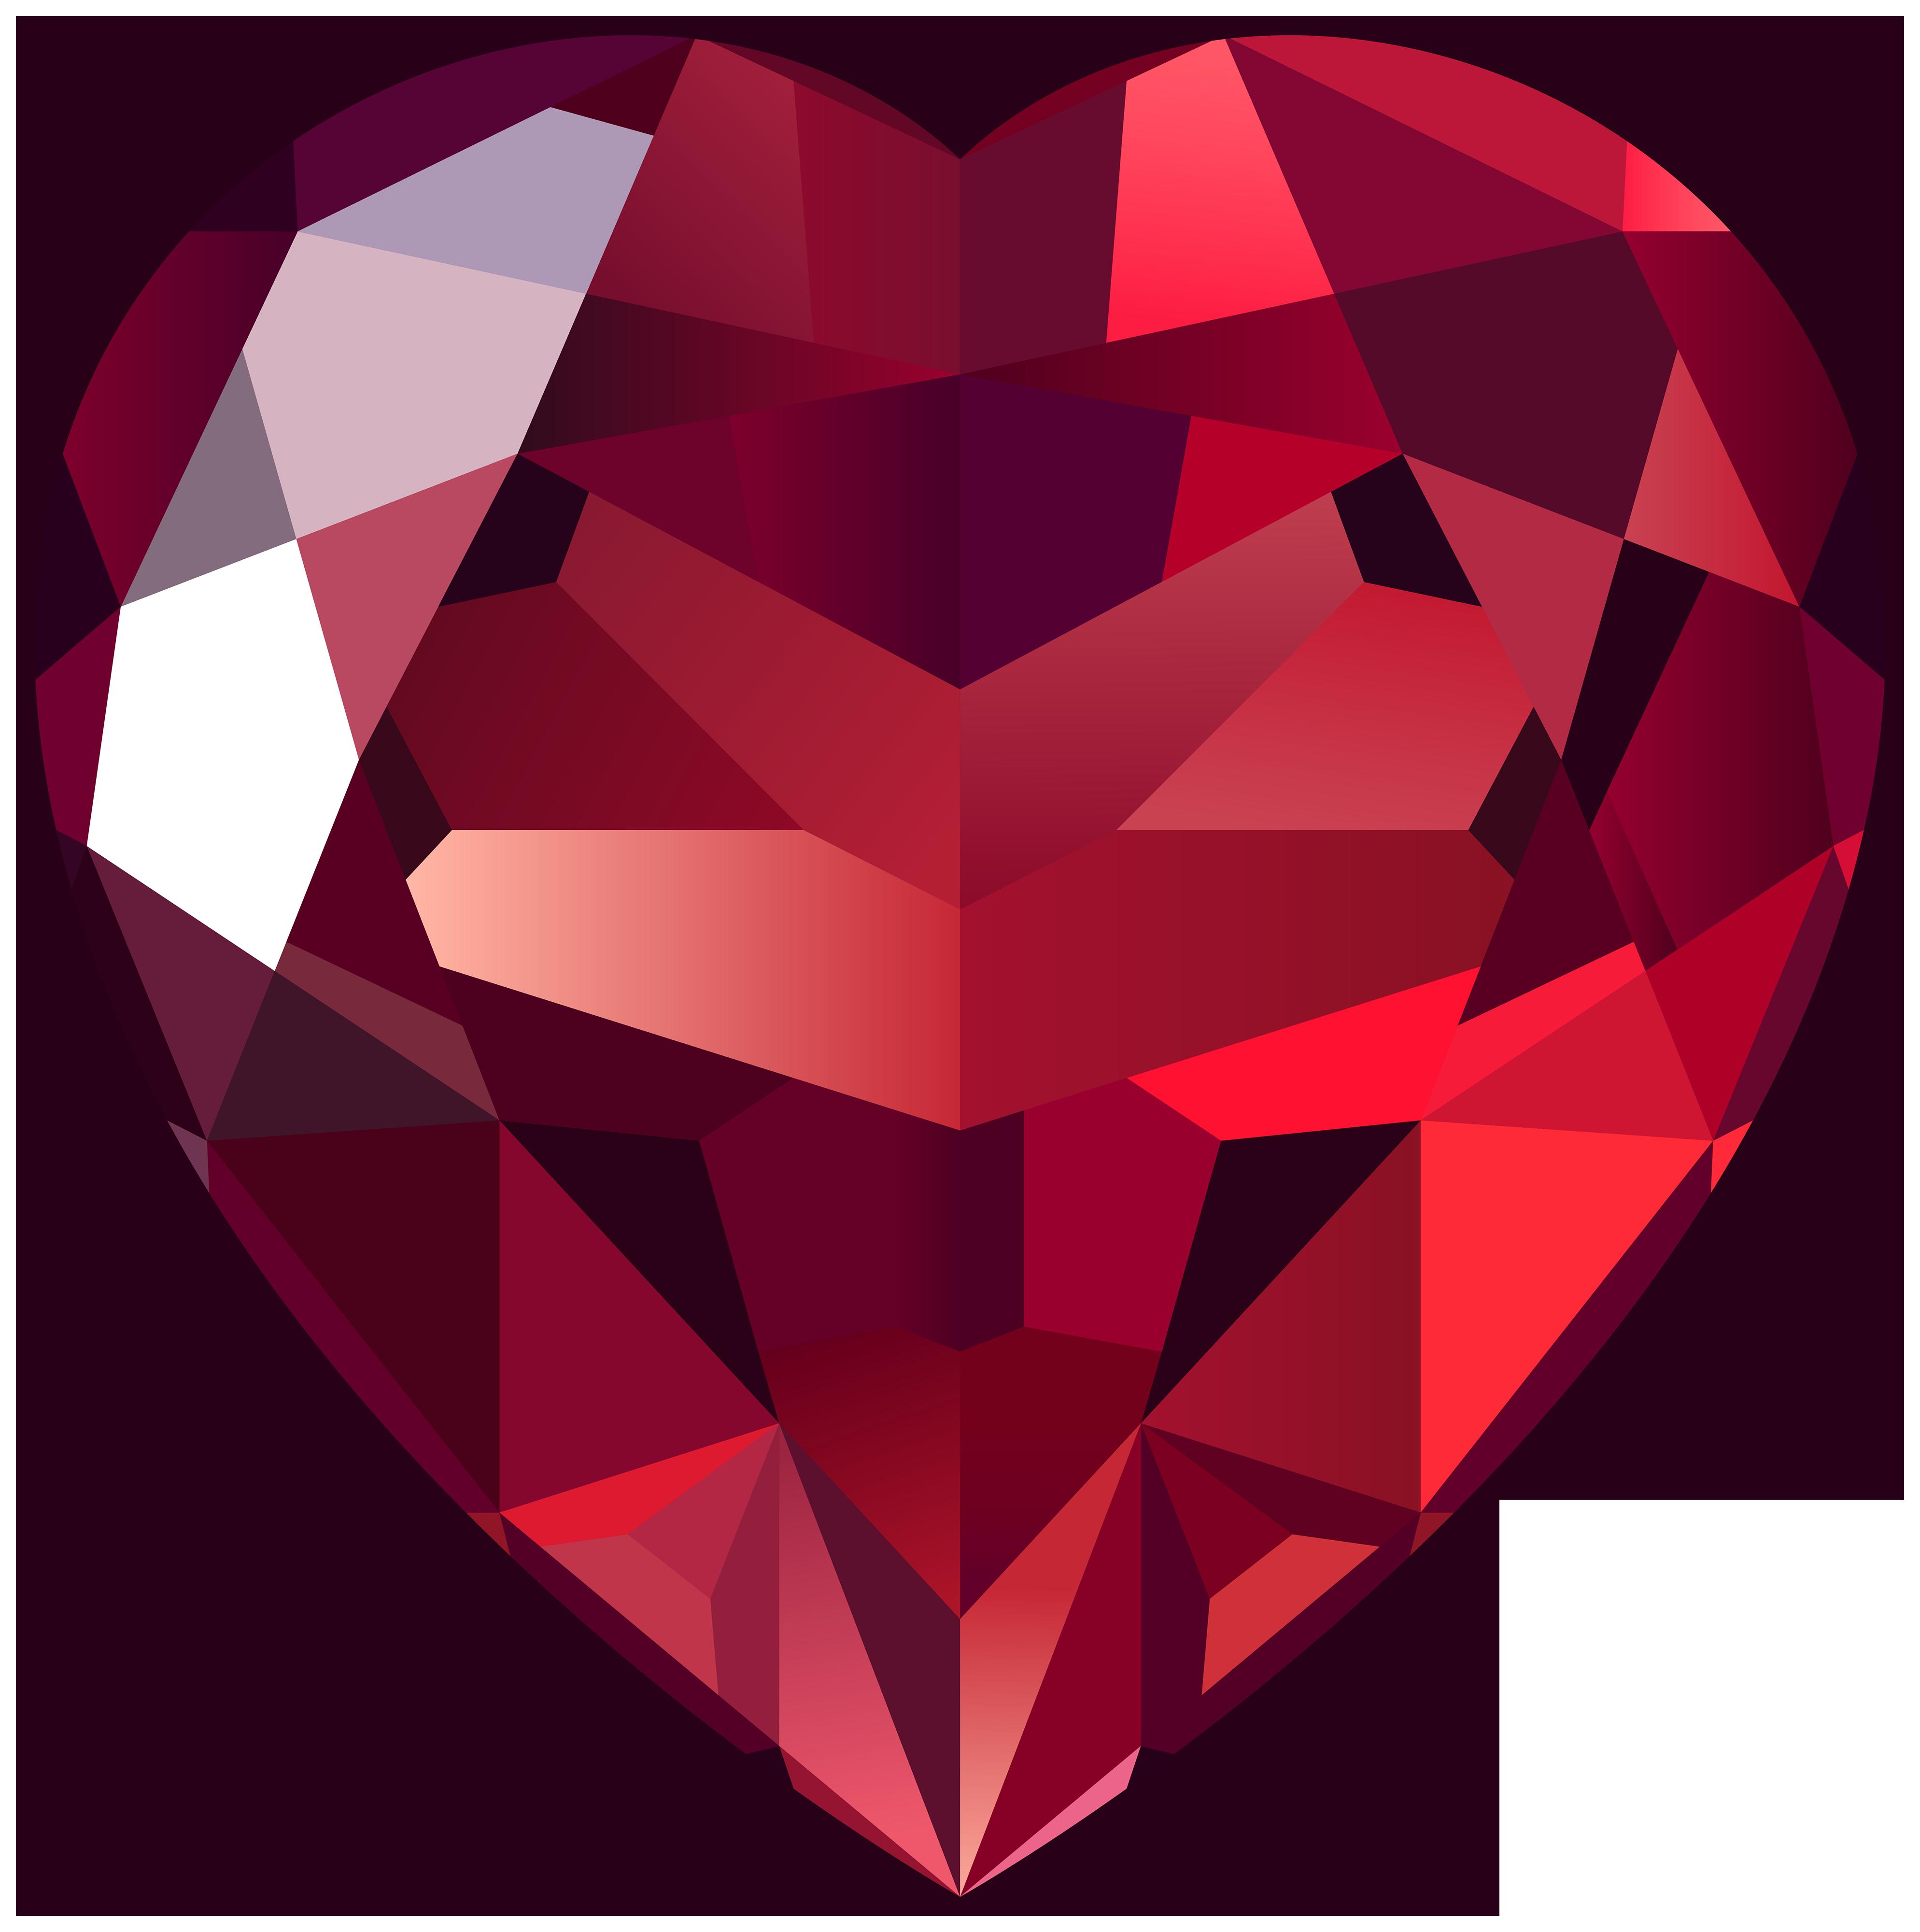 Gem clipart heart. Pin by hopeless on